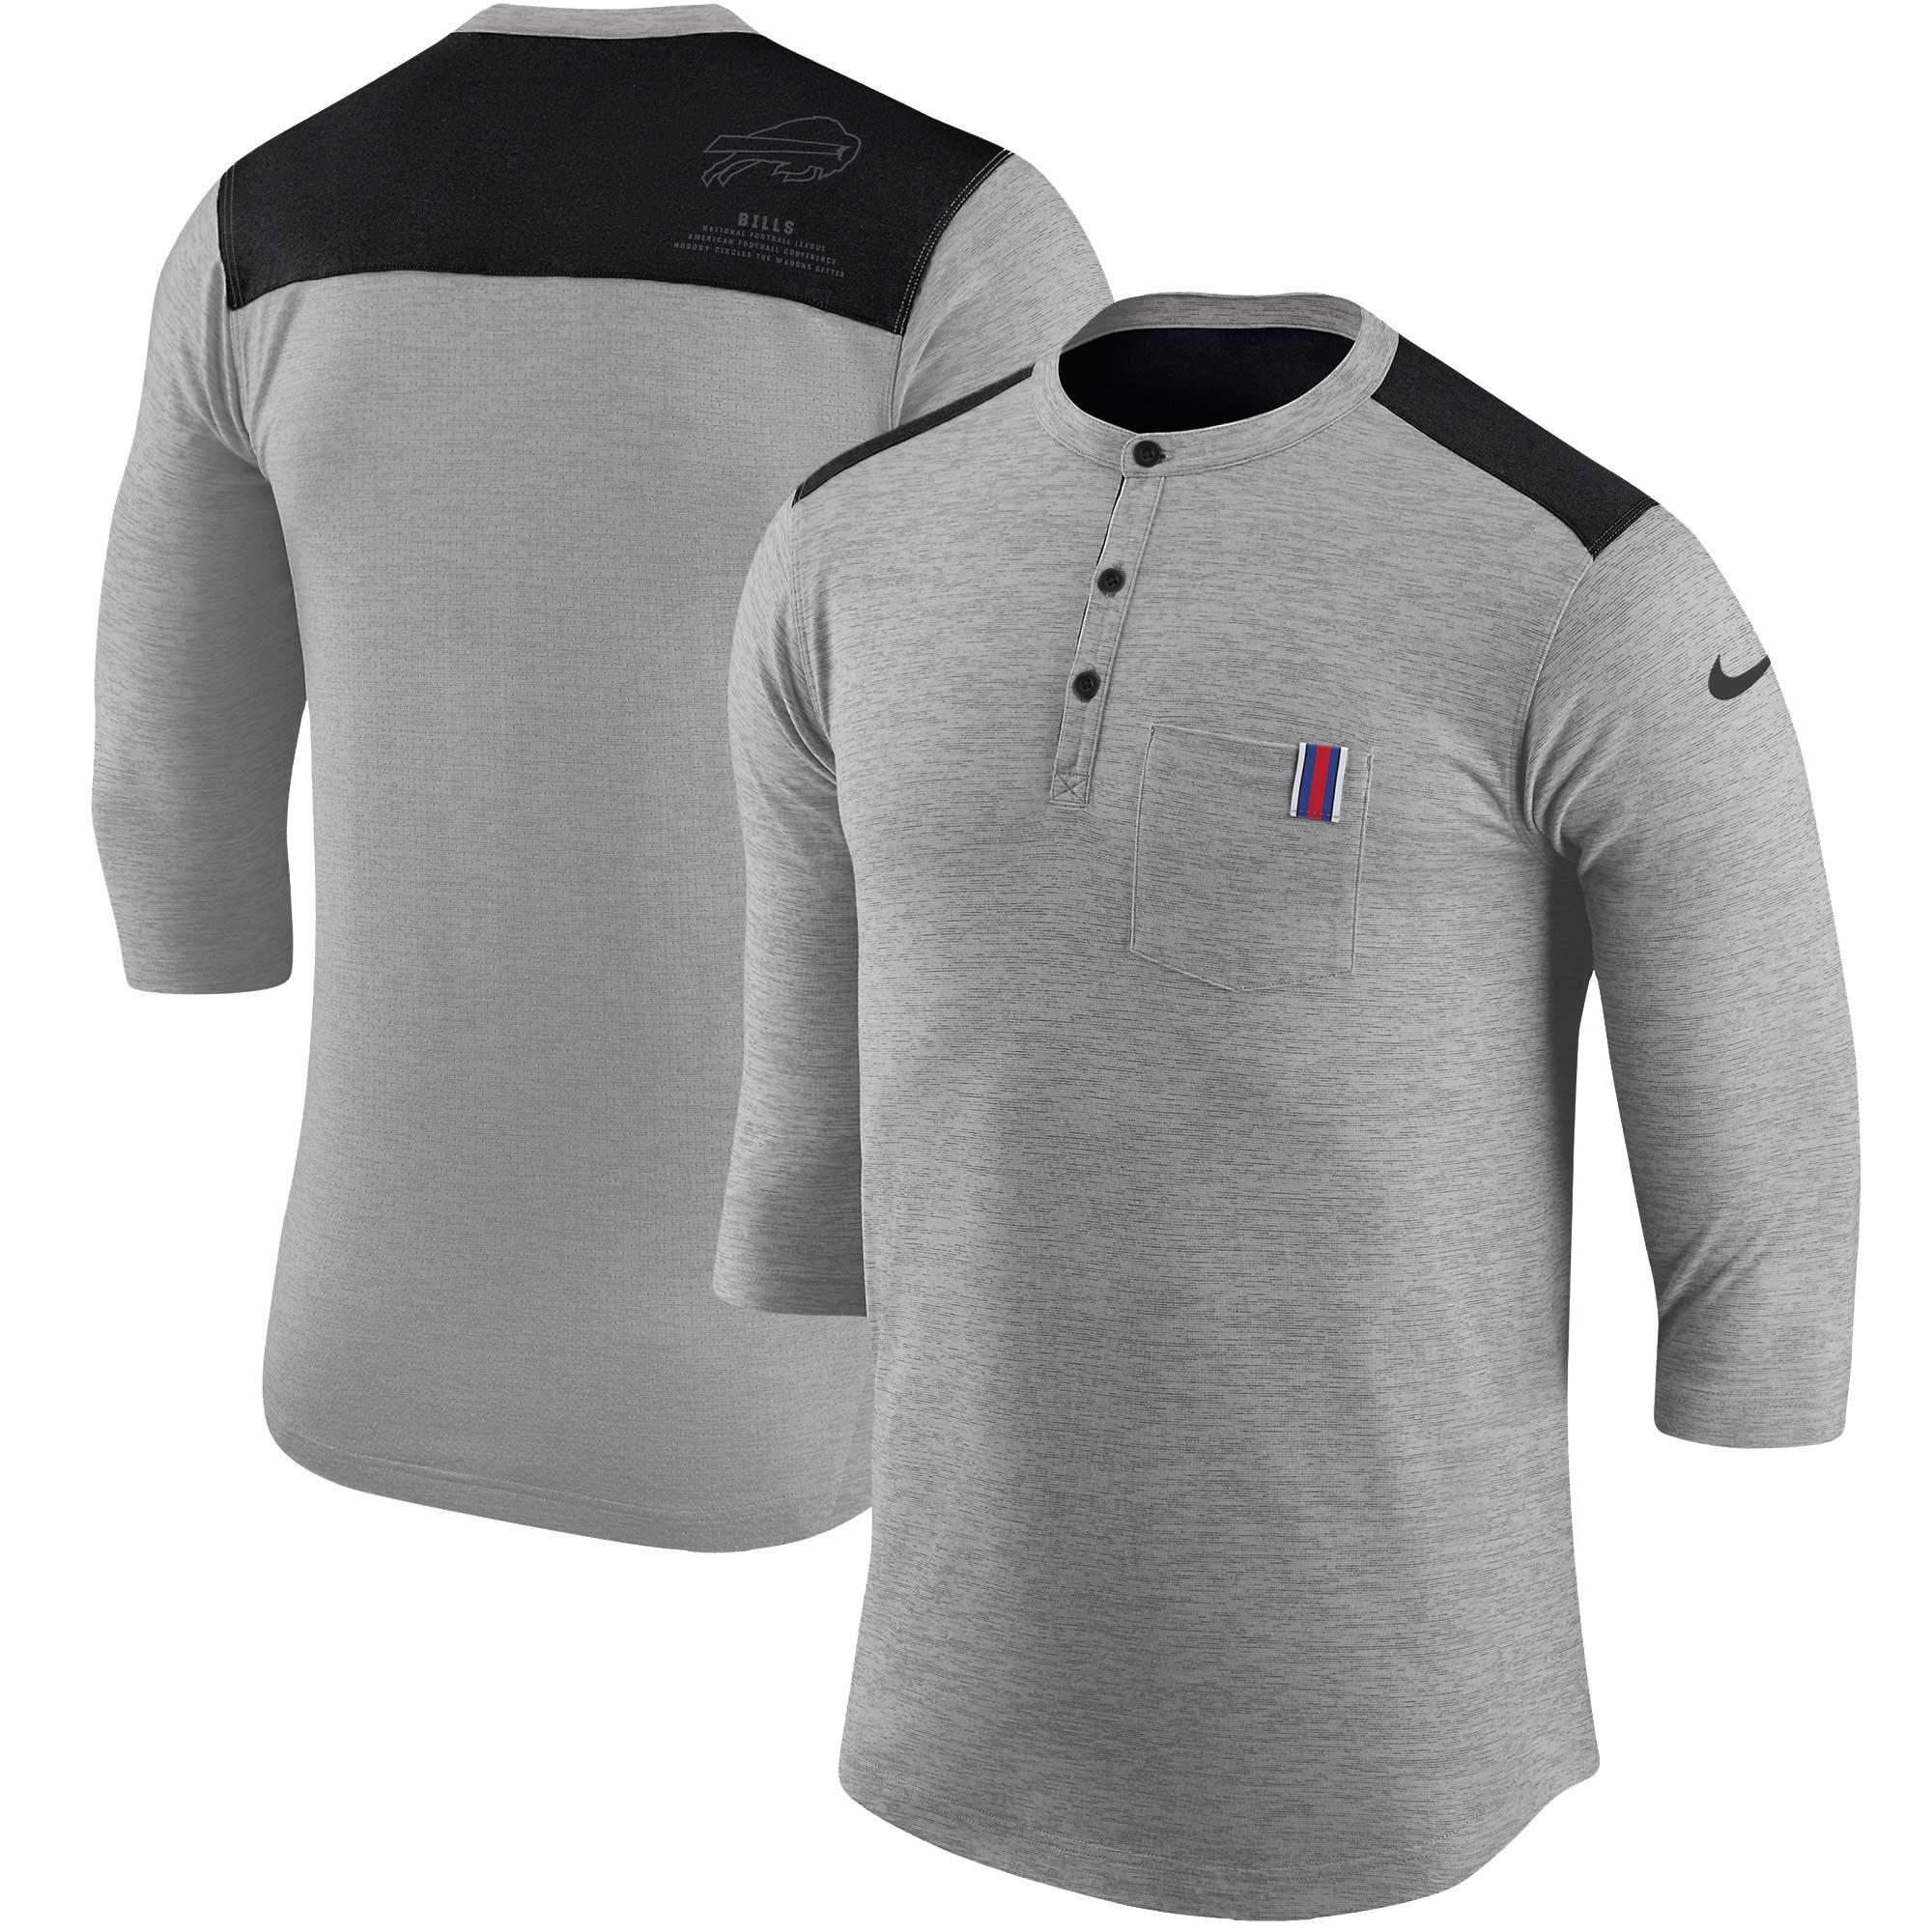 Buffalo Bills Nike Performance Henley 3/4-Sleeve T-Shirt - Heathered Gray/Black